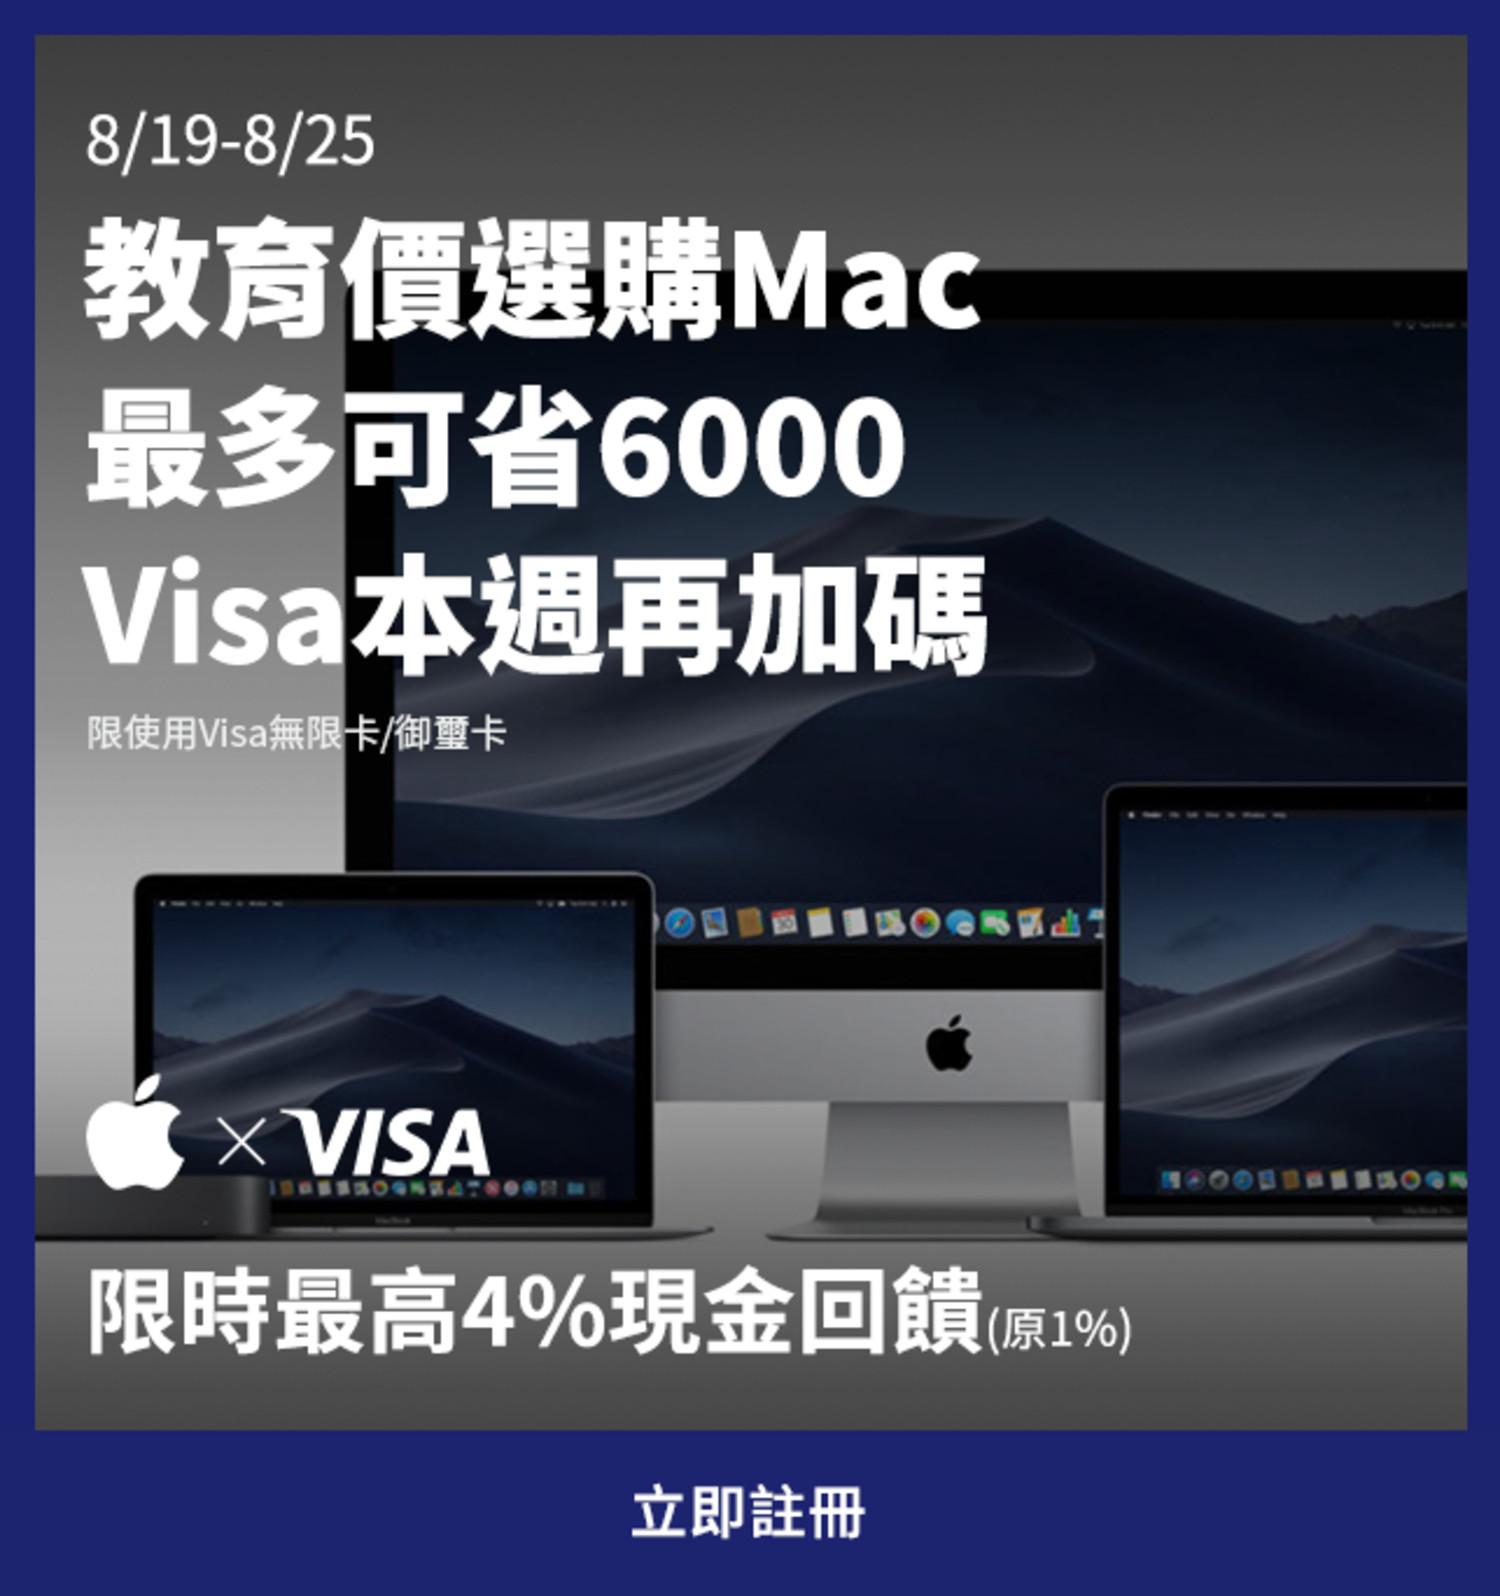 Visa X 蘋果官網 8/19-8/25